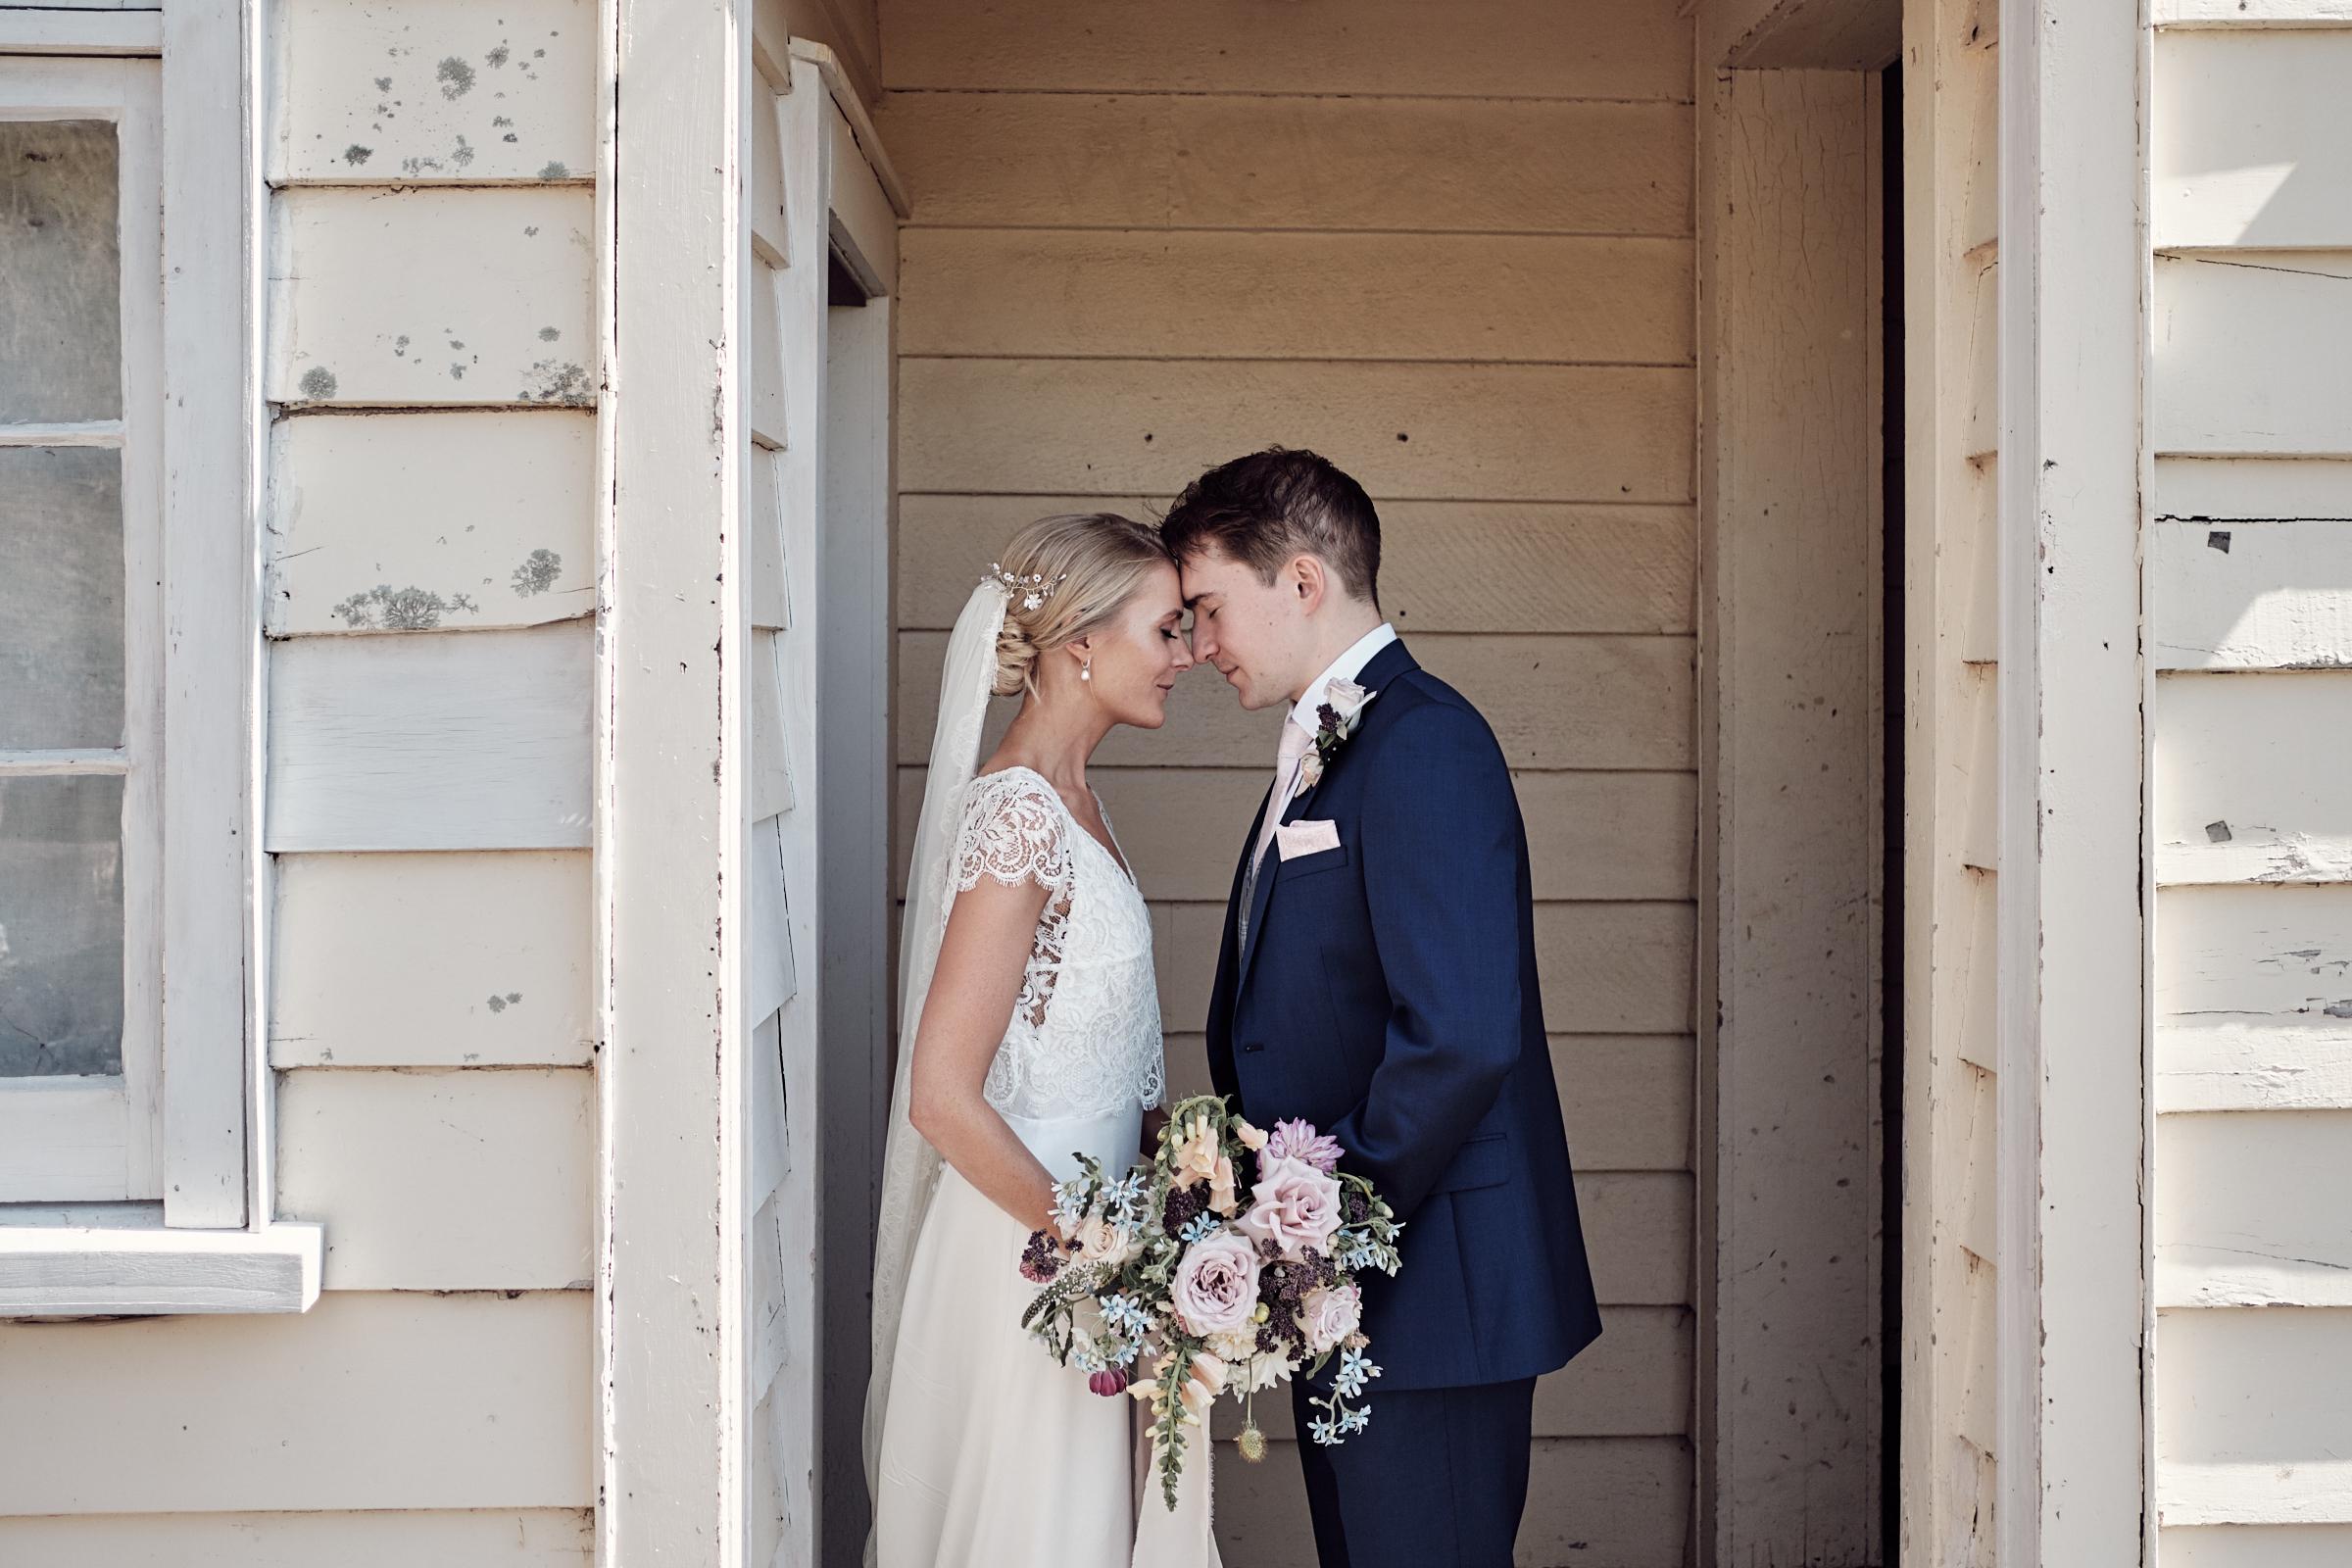 Cute wedding moments